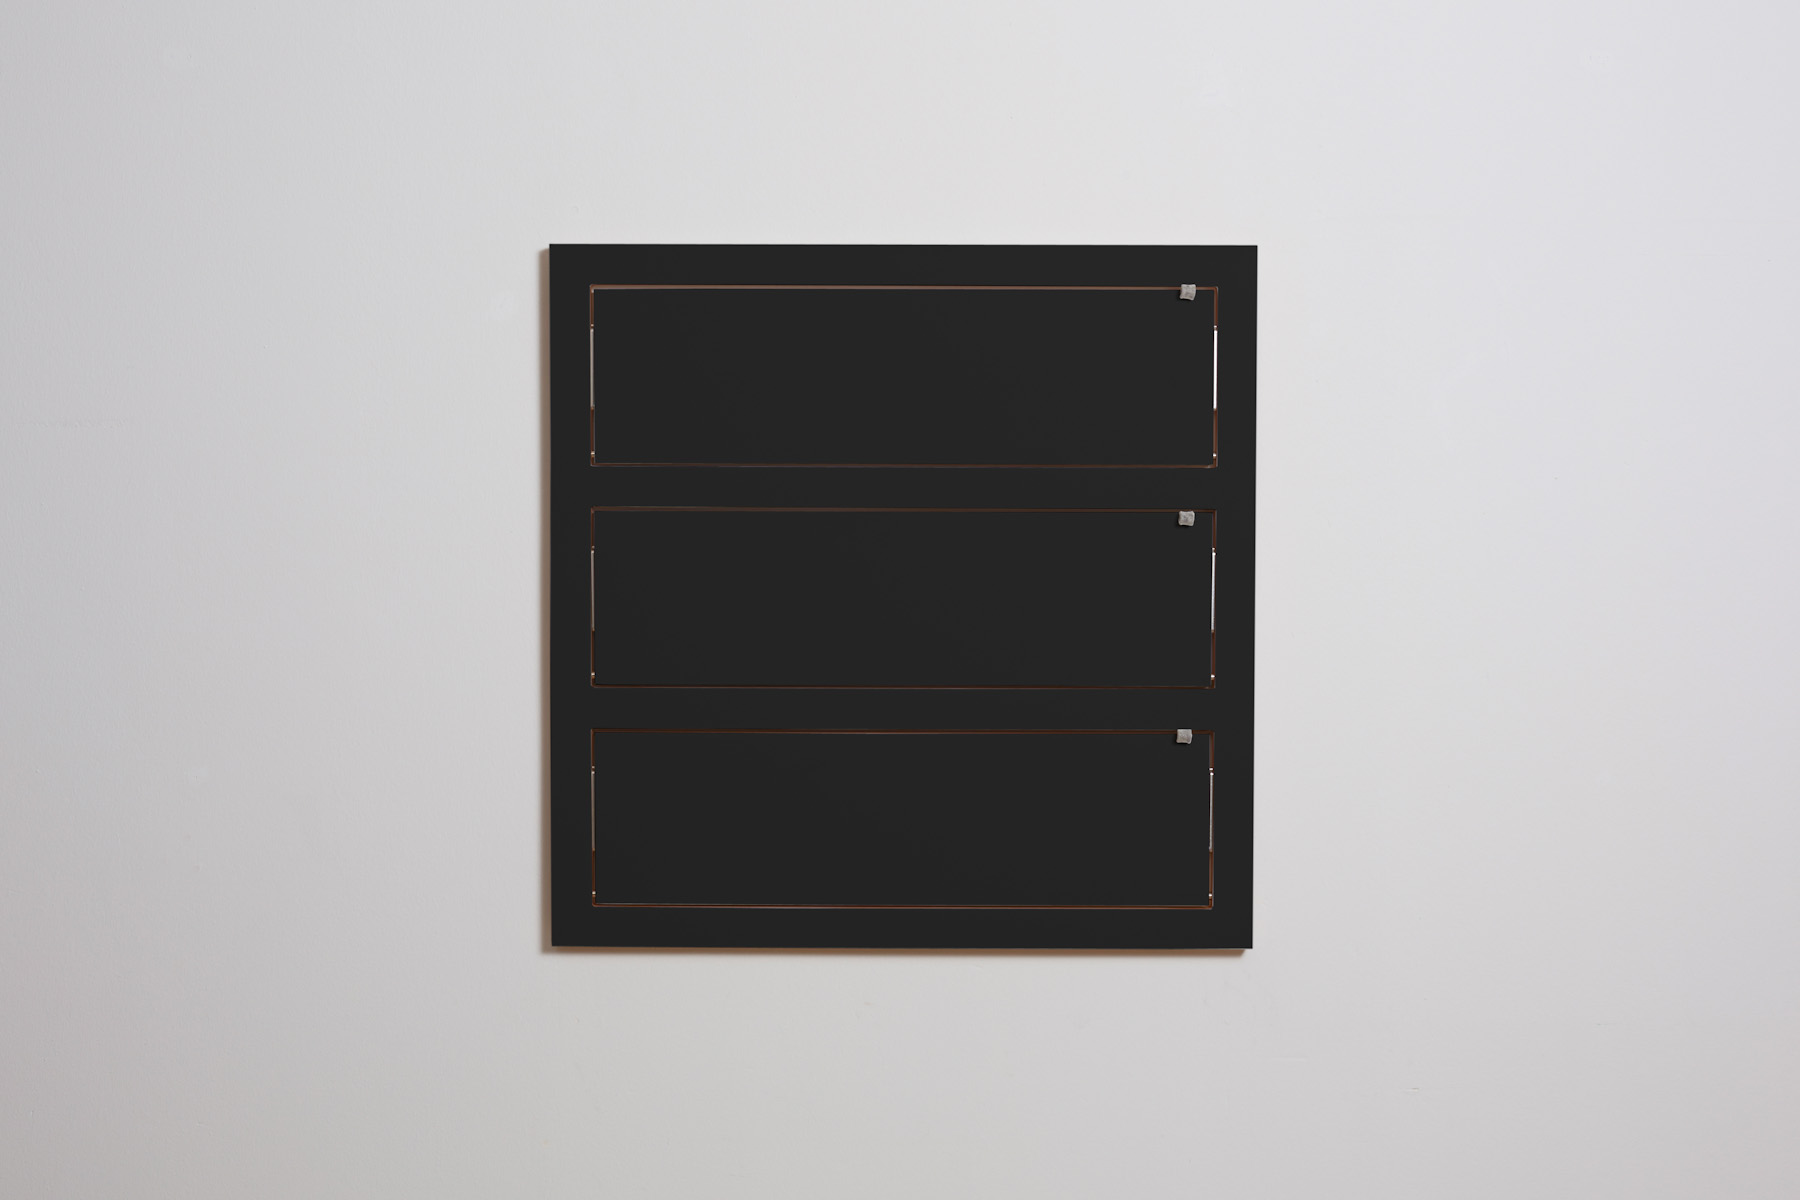 Ambivalenz-Hylde-Aflang-80x80x3-11